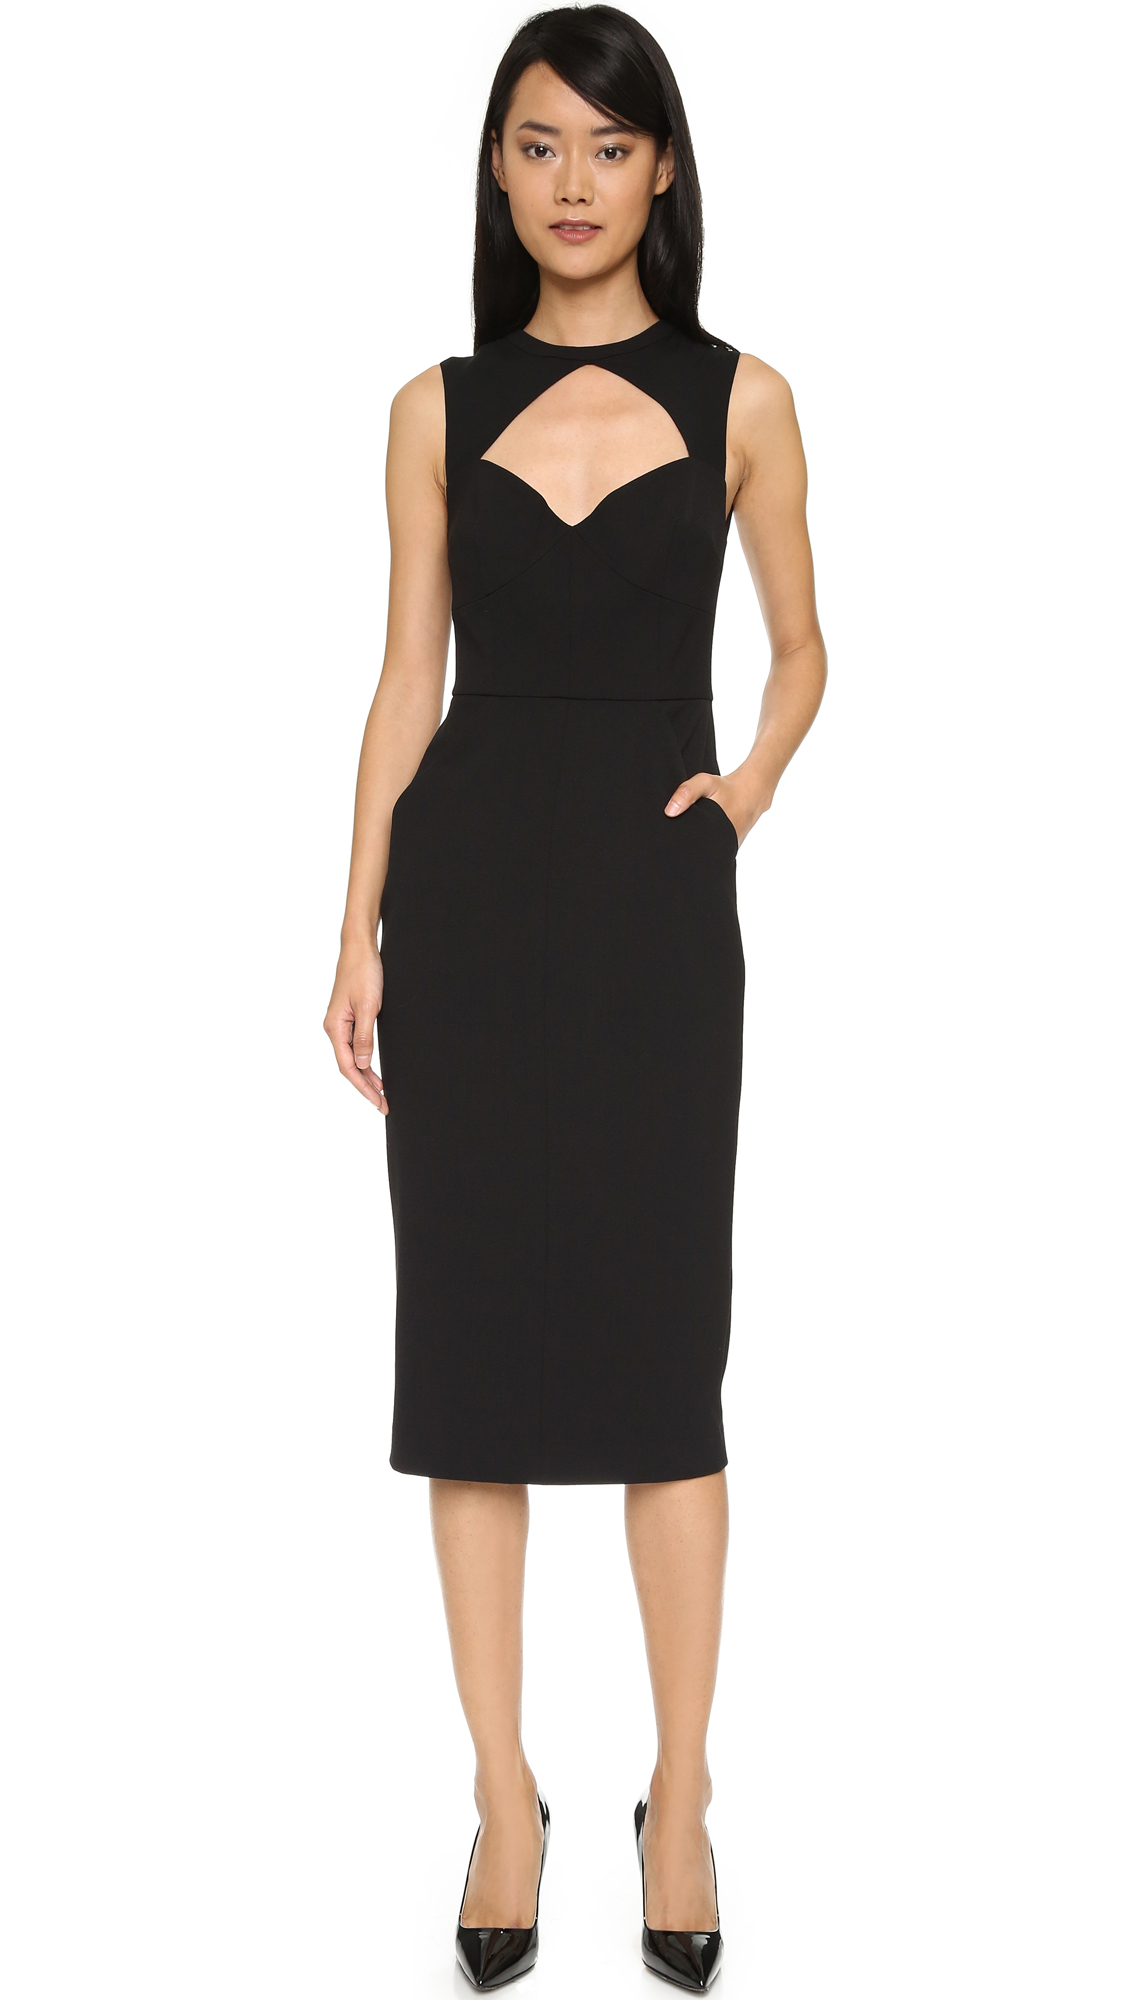 A.L.C. Elizabeth Dress - Black at Shopbop